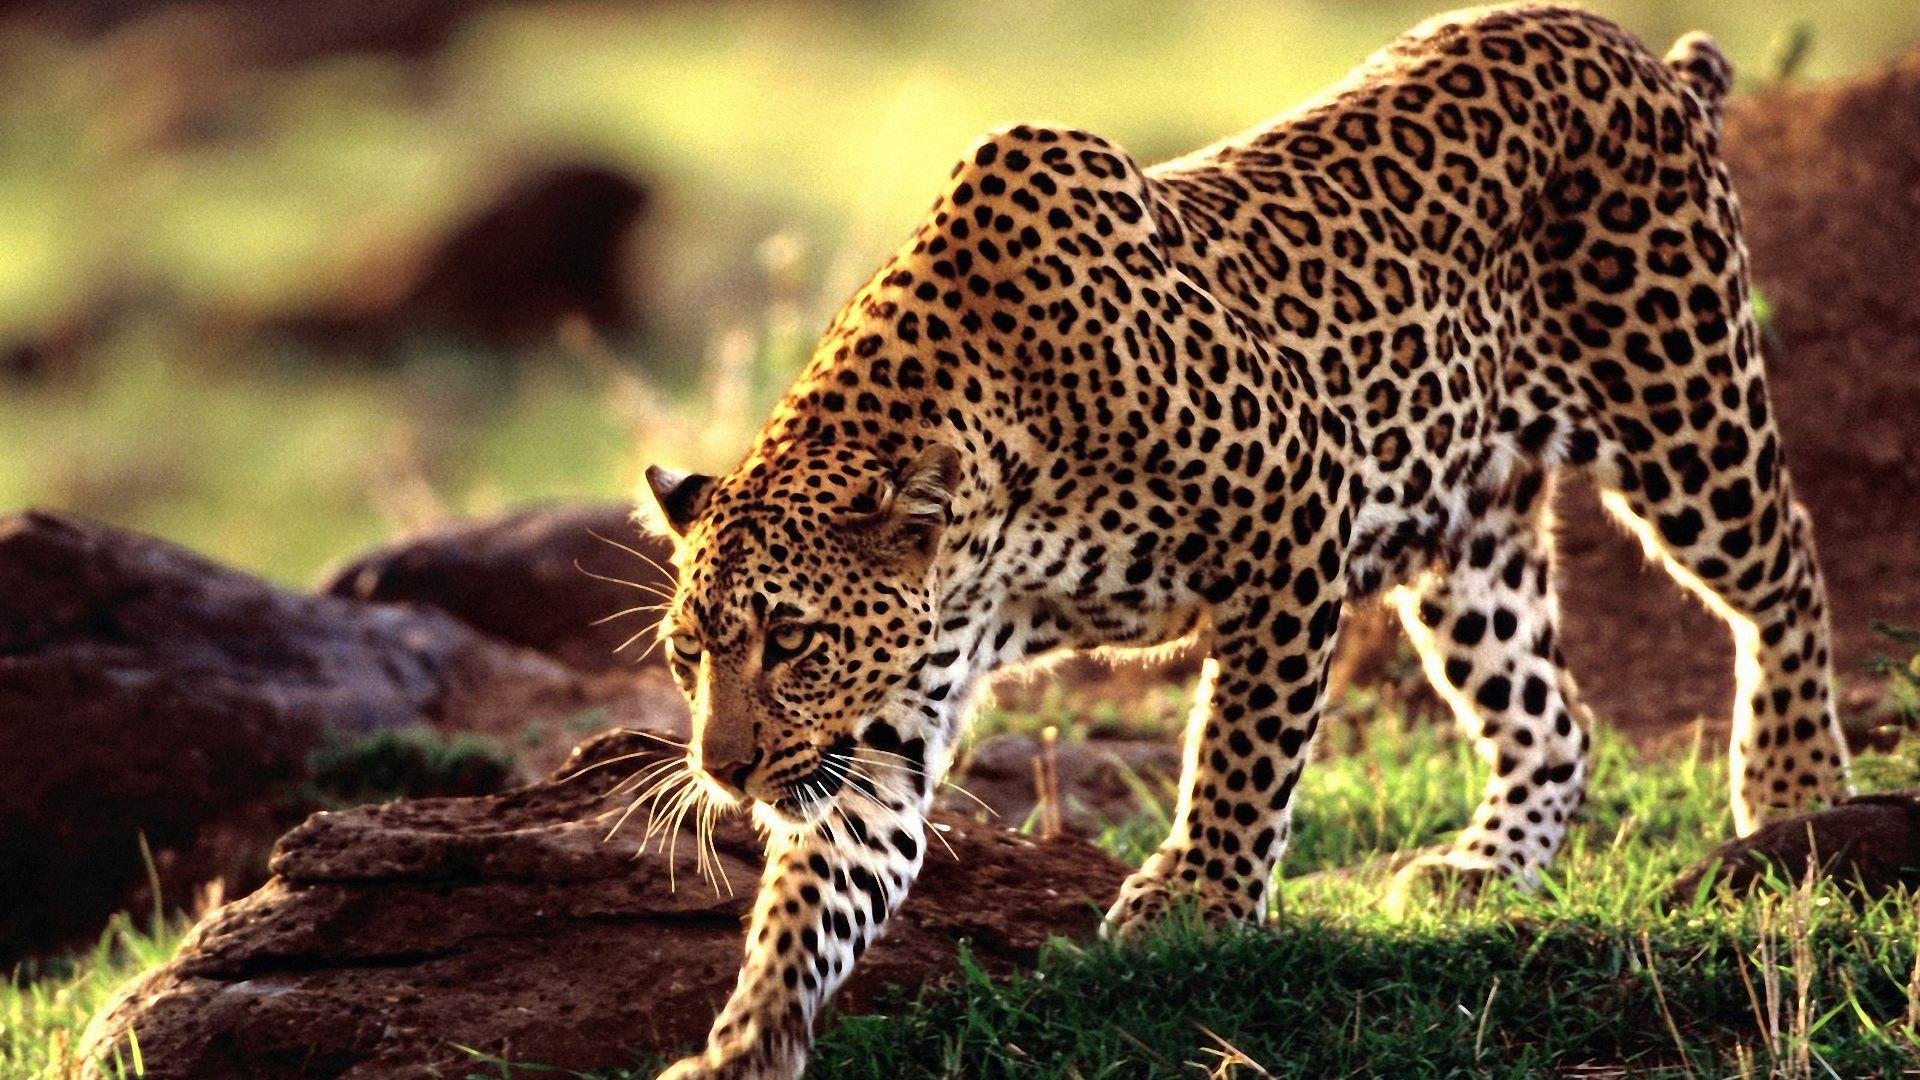 Leopard Wallpaper 1920x1080 WallpapersLeopard 1920x1080 1920x1080